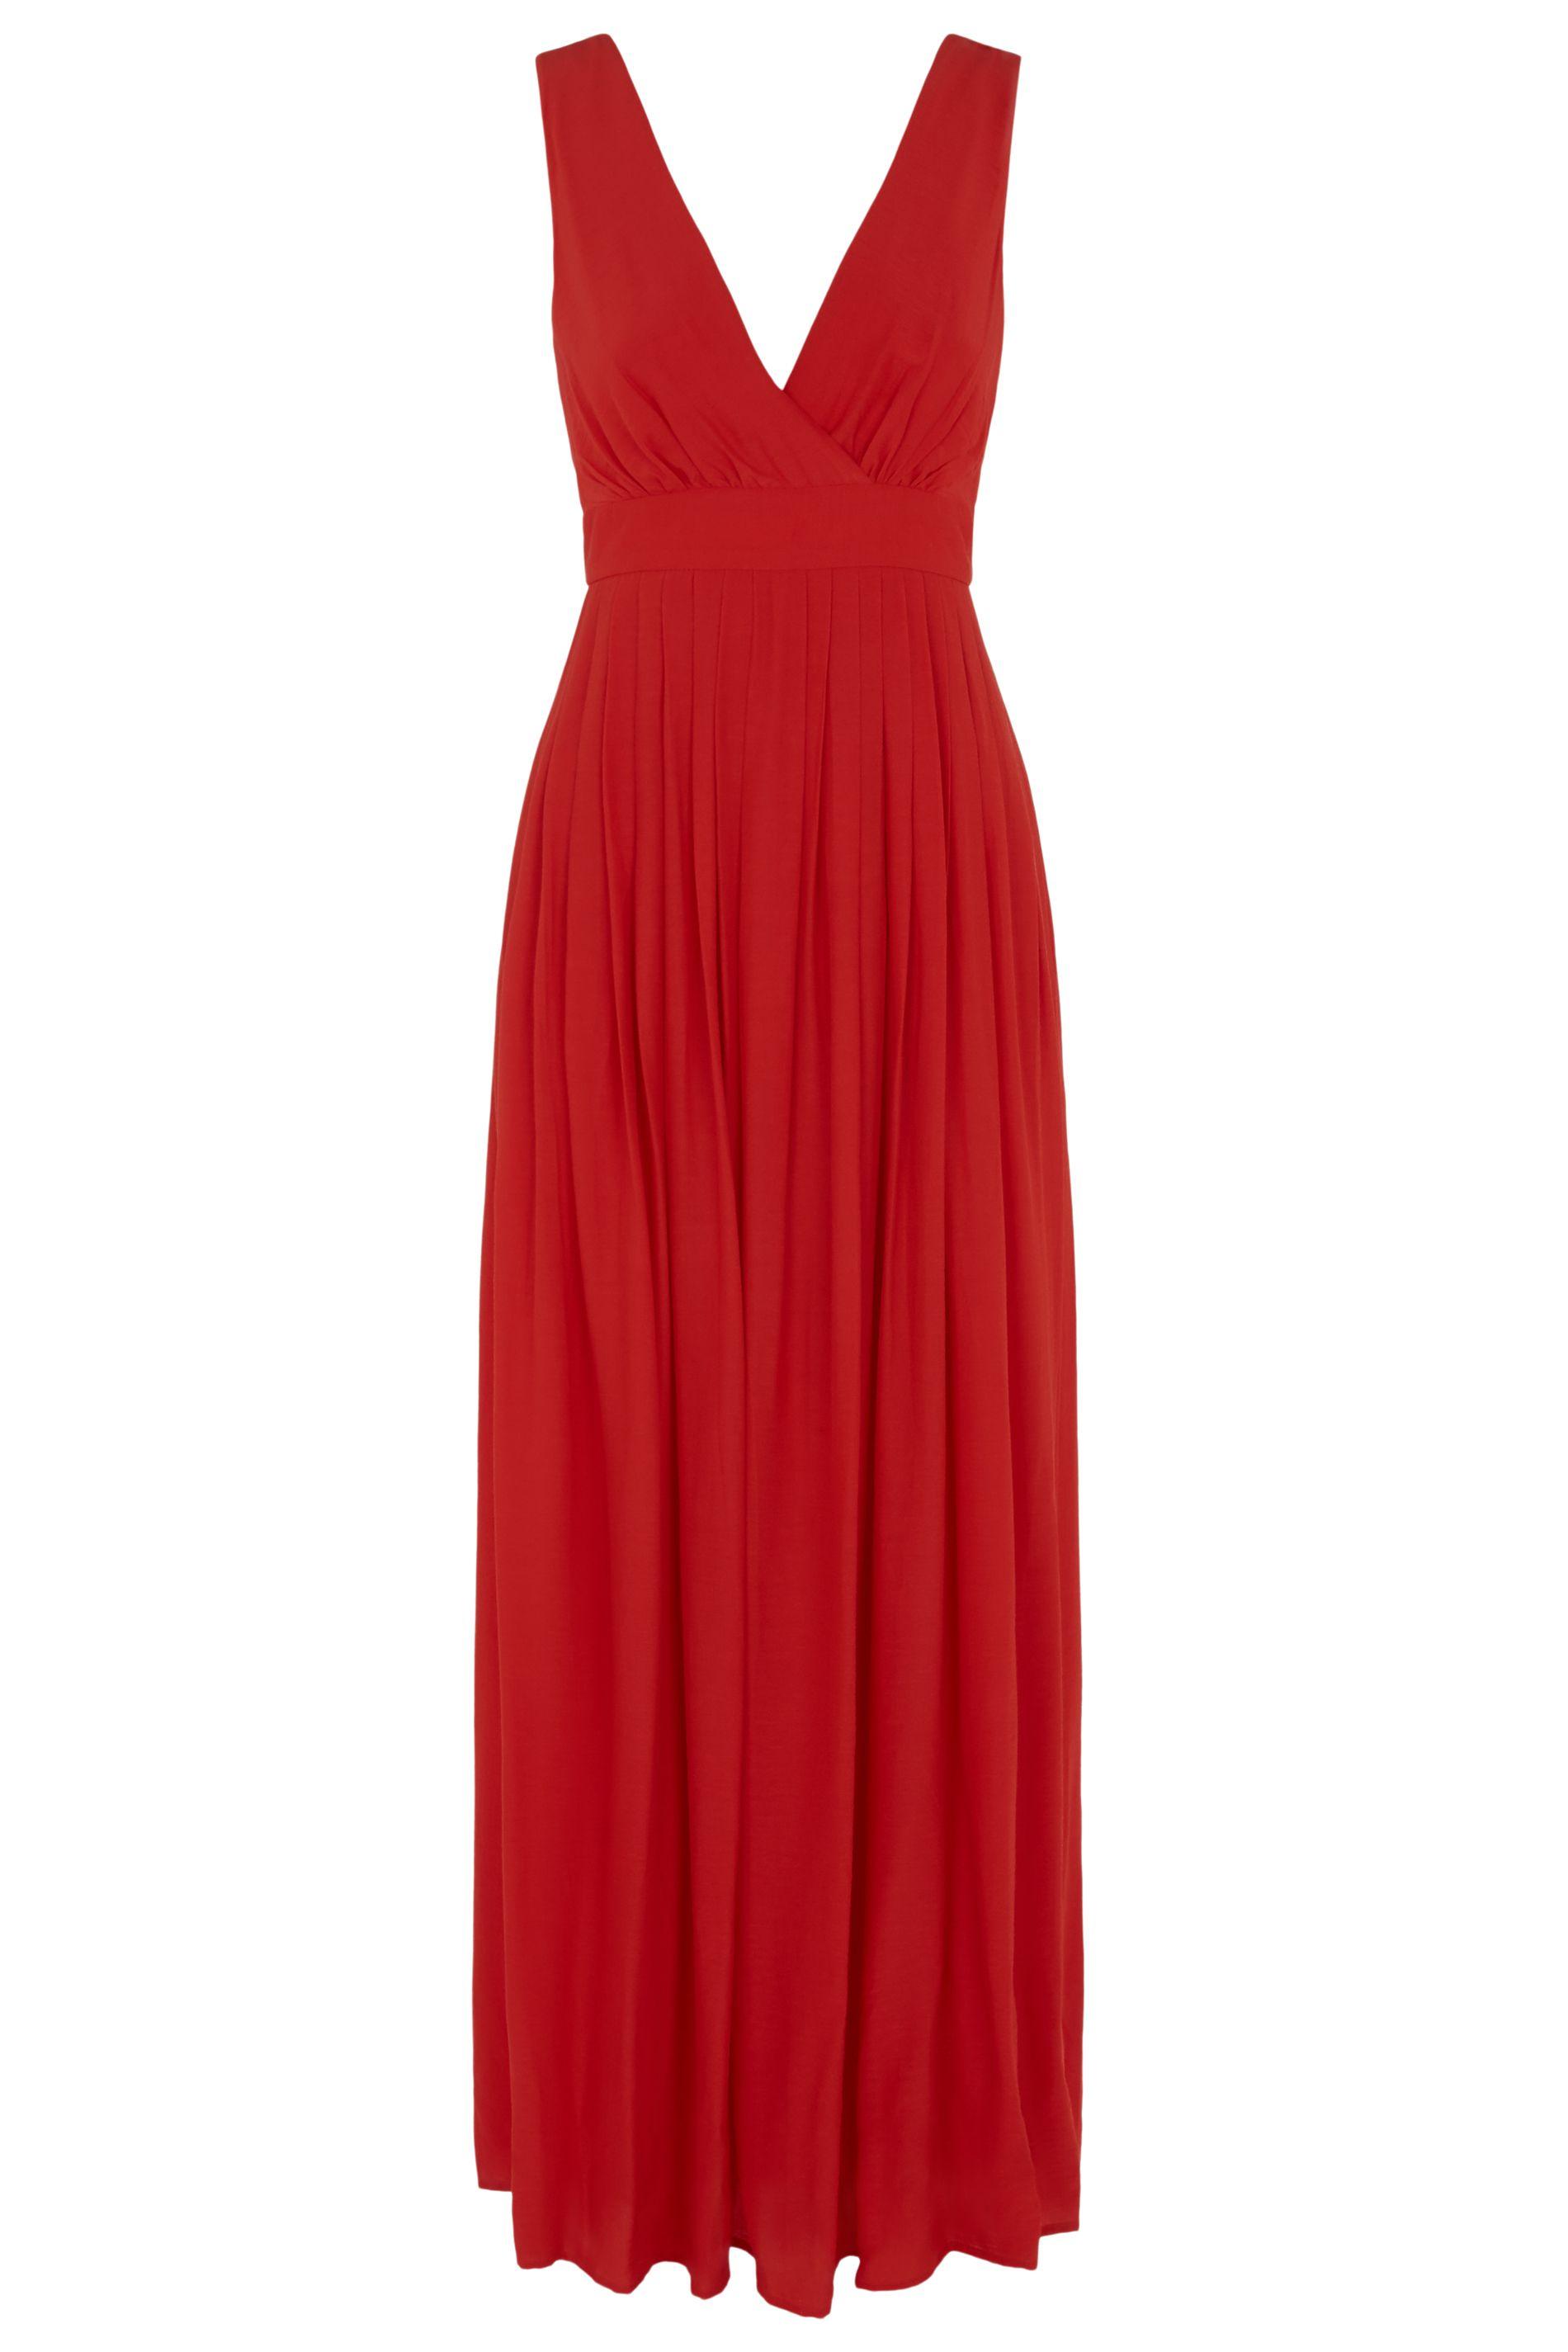 Fall V-neck Sleeveless Maxi Dress in Red